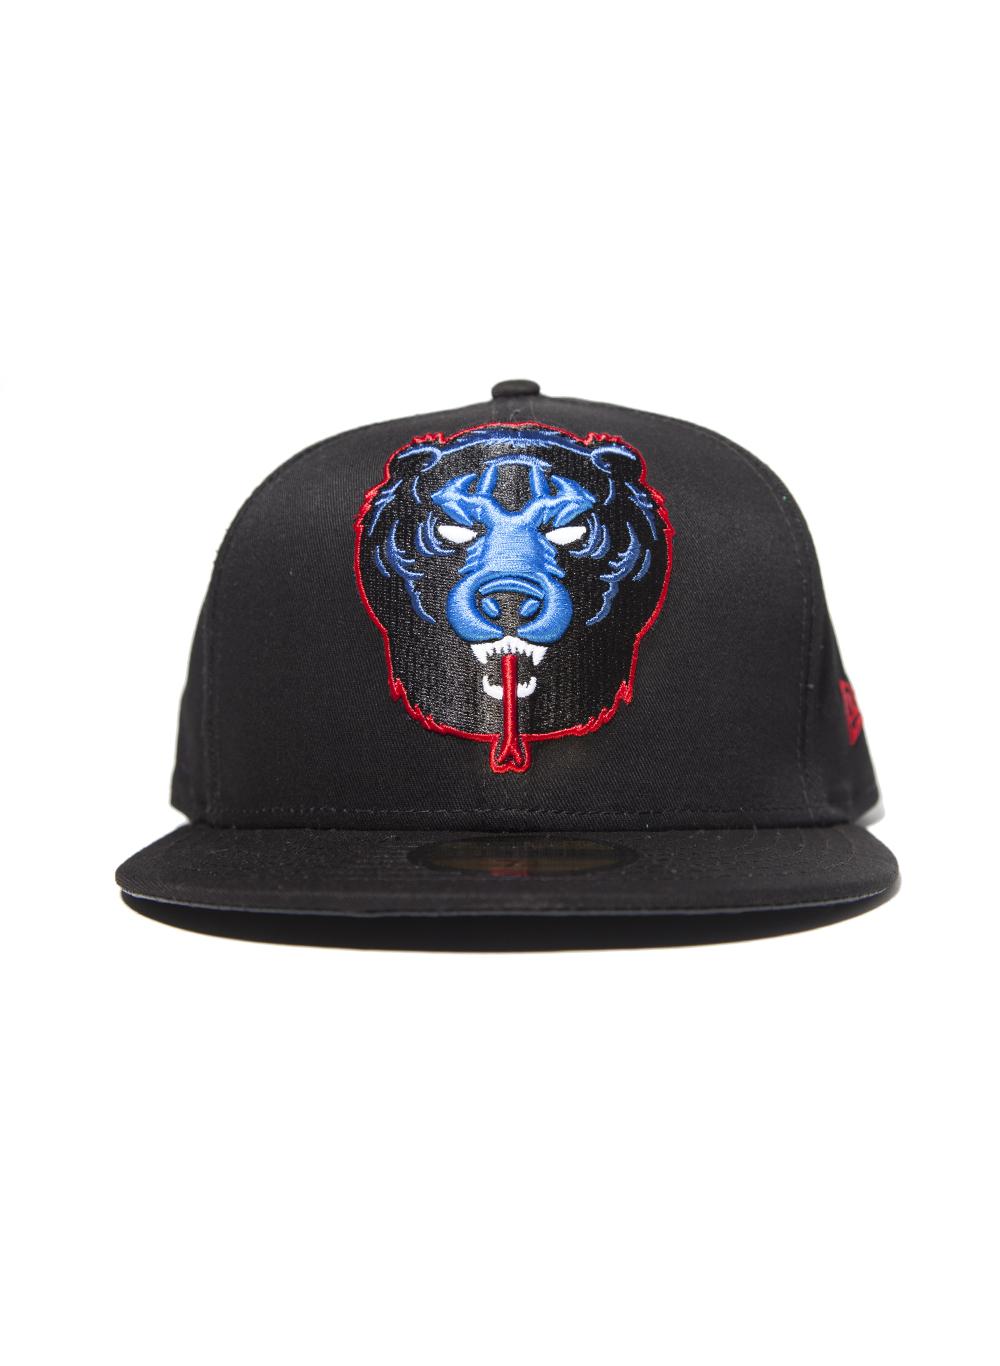 Mishka Heritage Death Adder New Era 5950 Fitted Hats